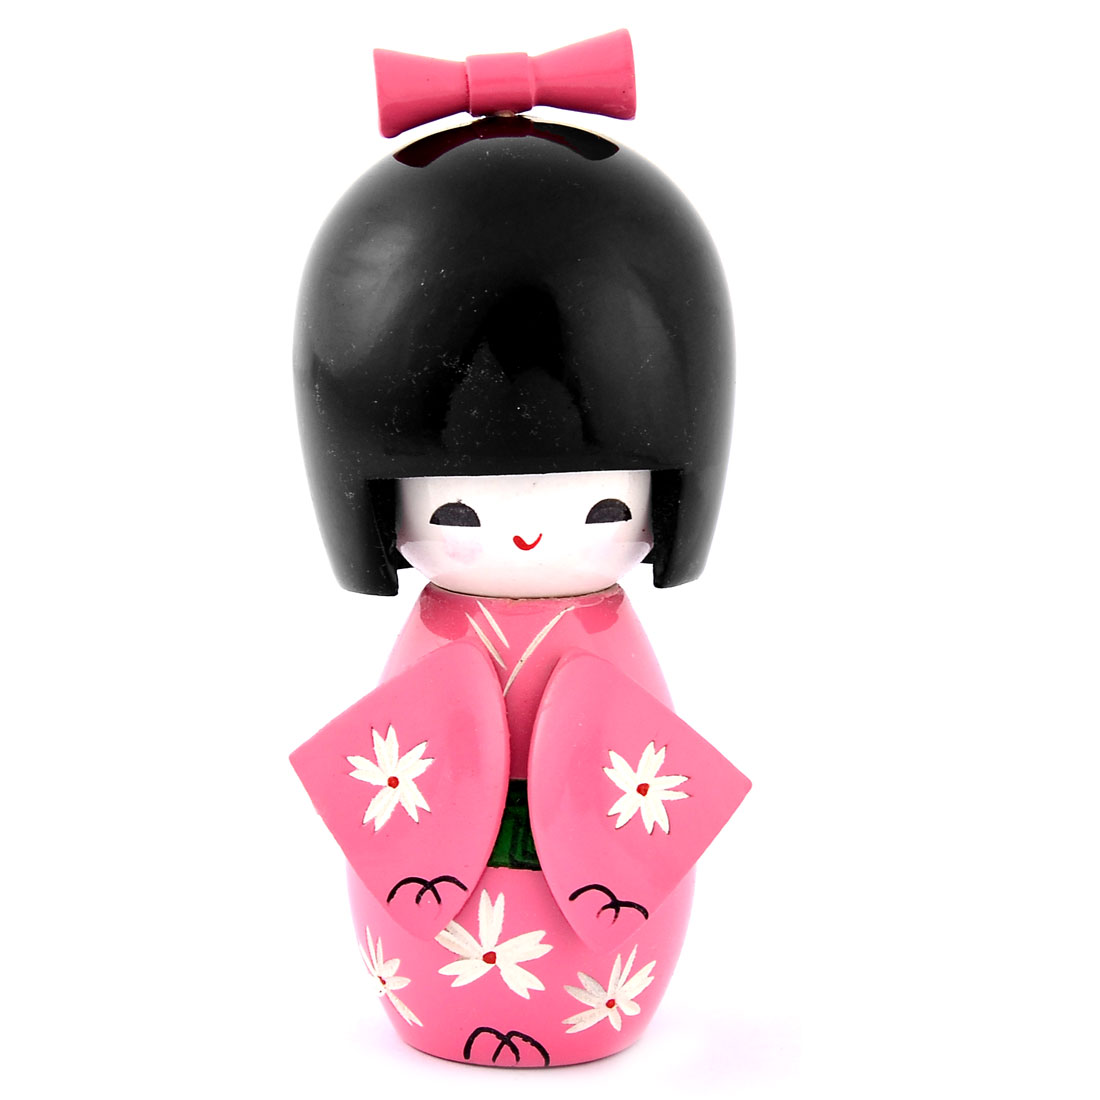 Home Wooden Decorative Japanese Kimono Kokeshi Doll Craft Pink